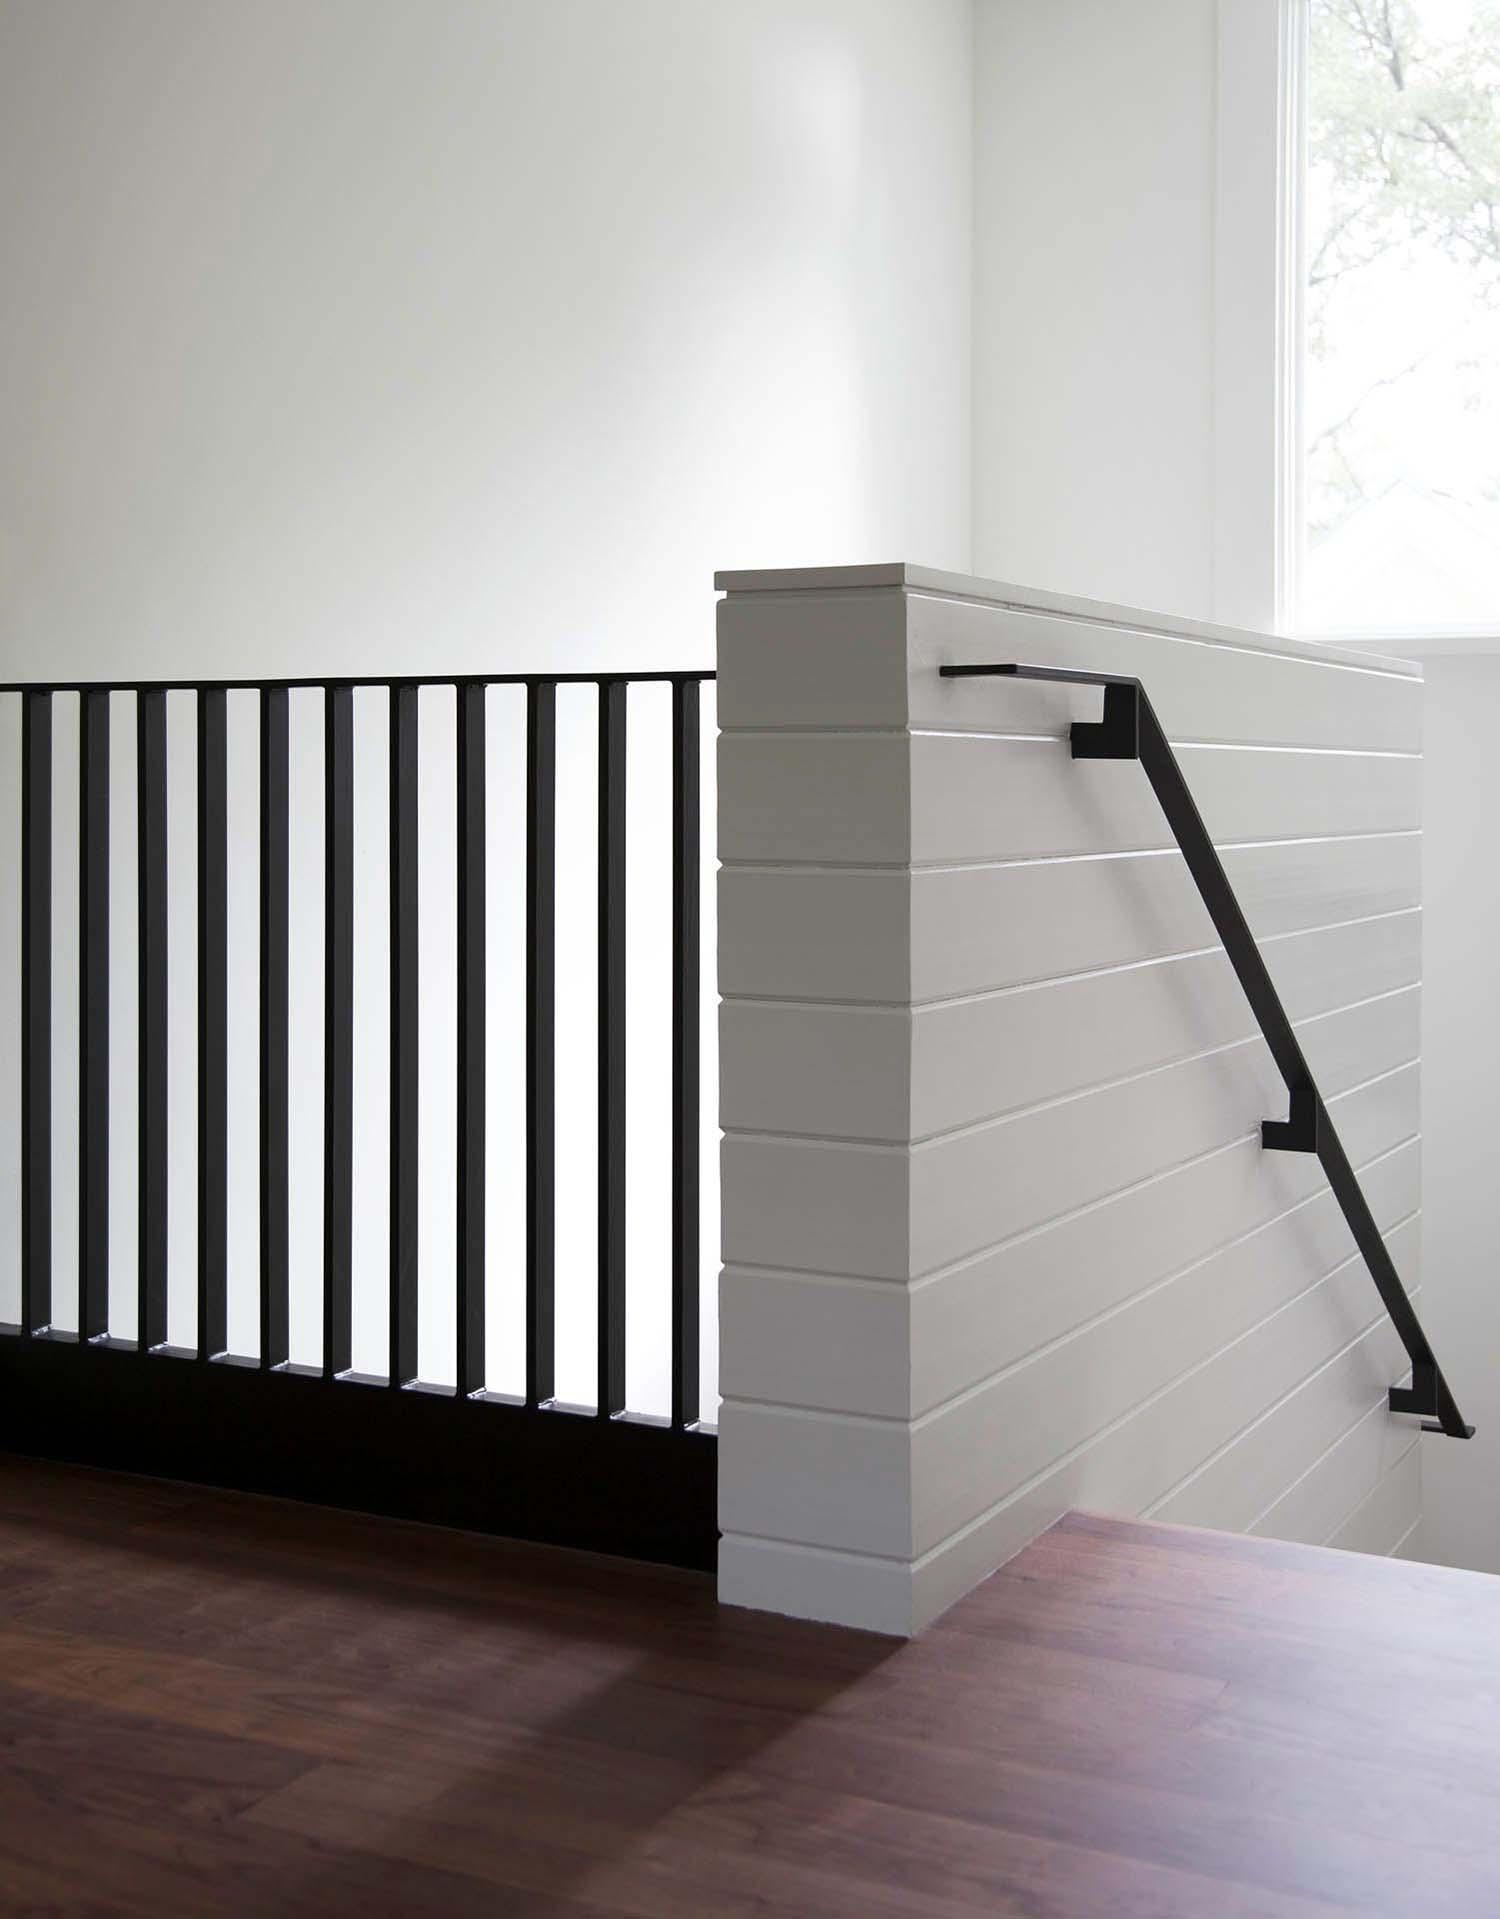 escalier-ferme-moderne